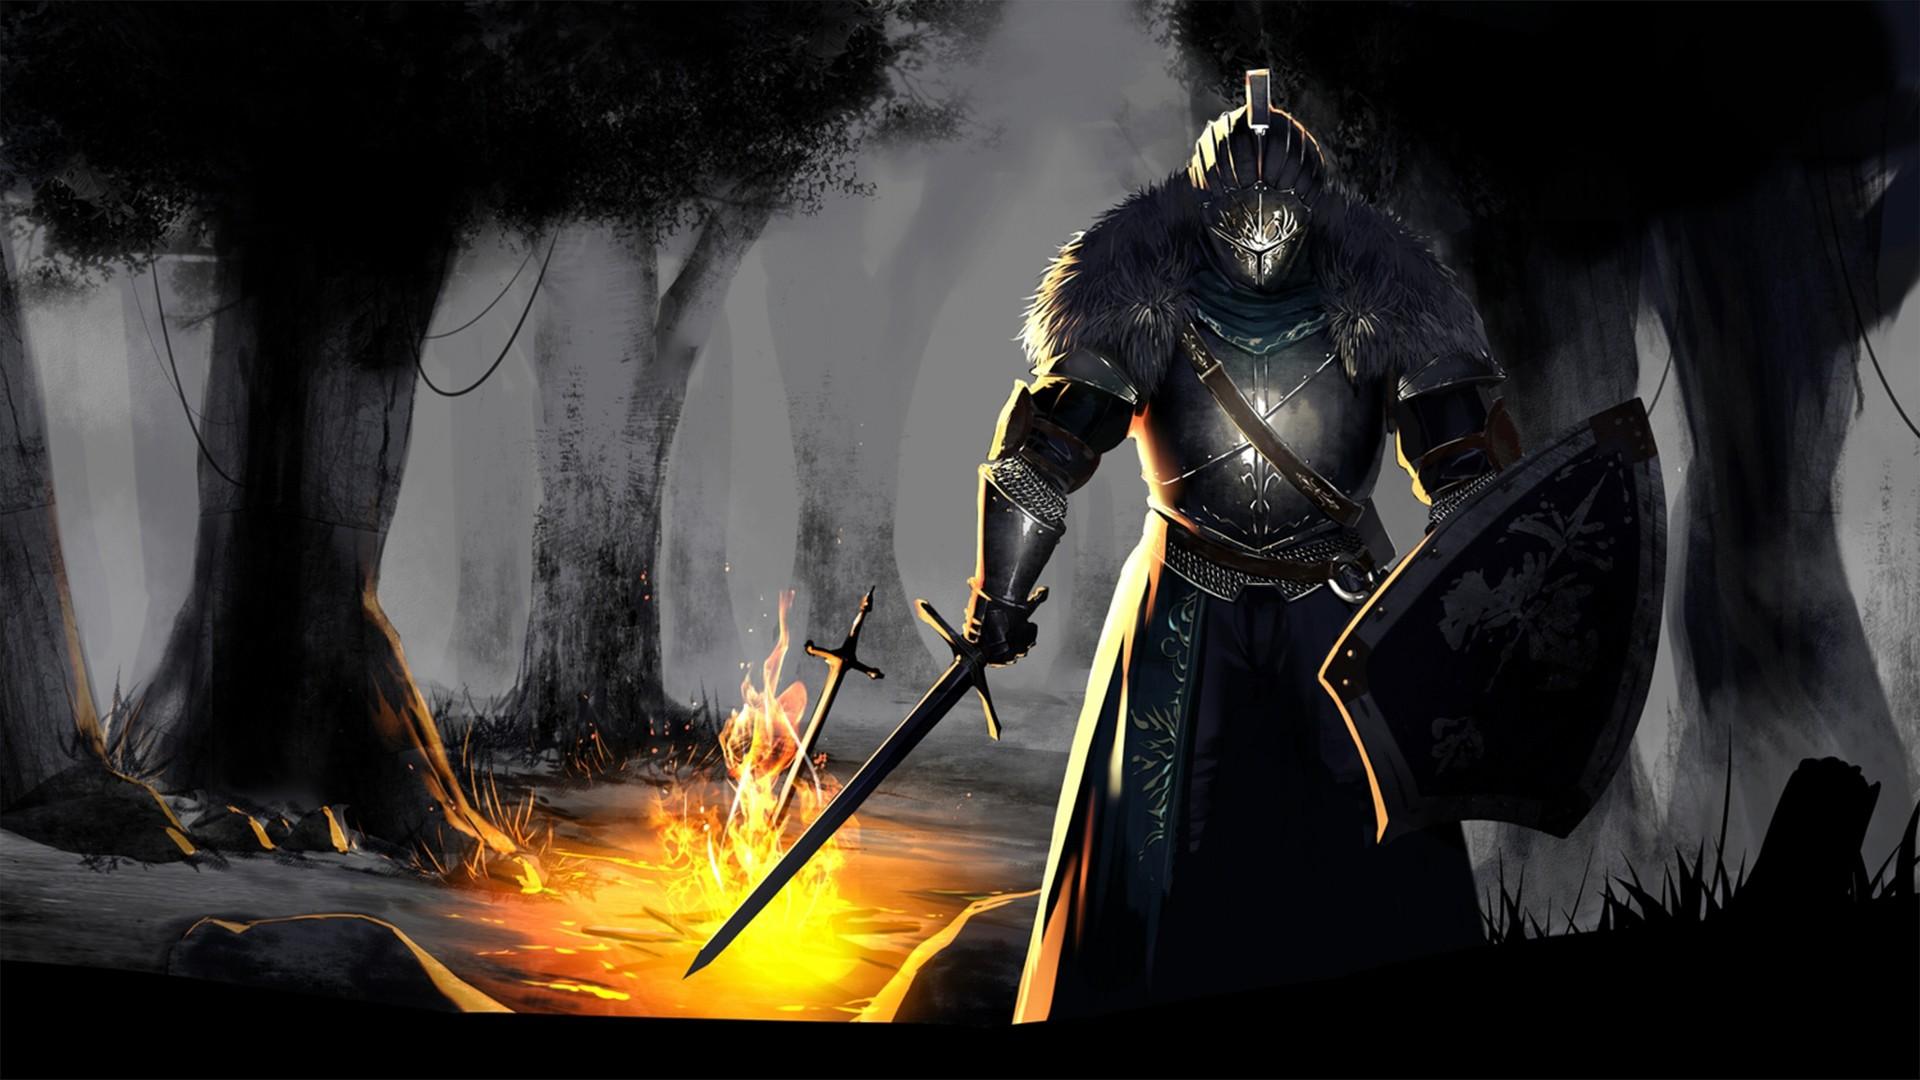 Wallpaper Forest Video Games Fantasy Art Dark Souls Ii Fire